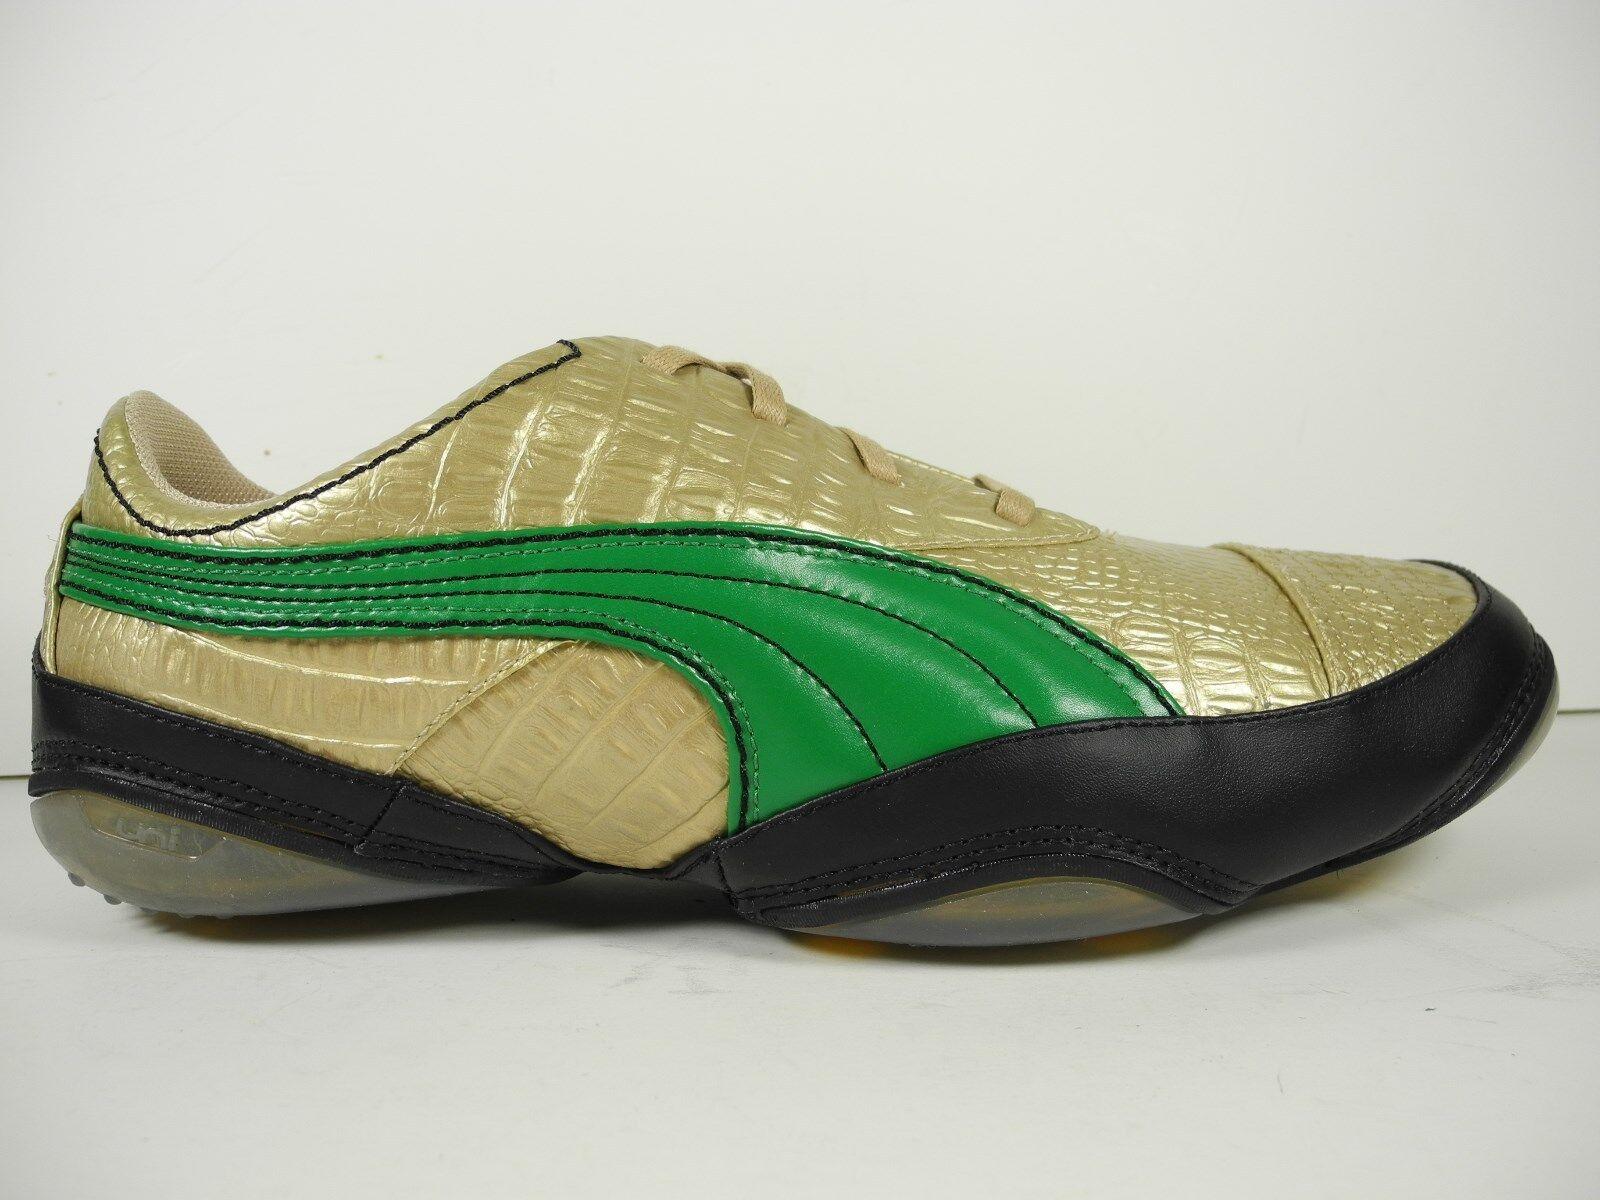 NEW Puma USAN METALLIC CROC Men's Shoes Size US 11.5